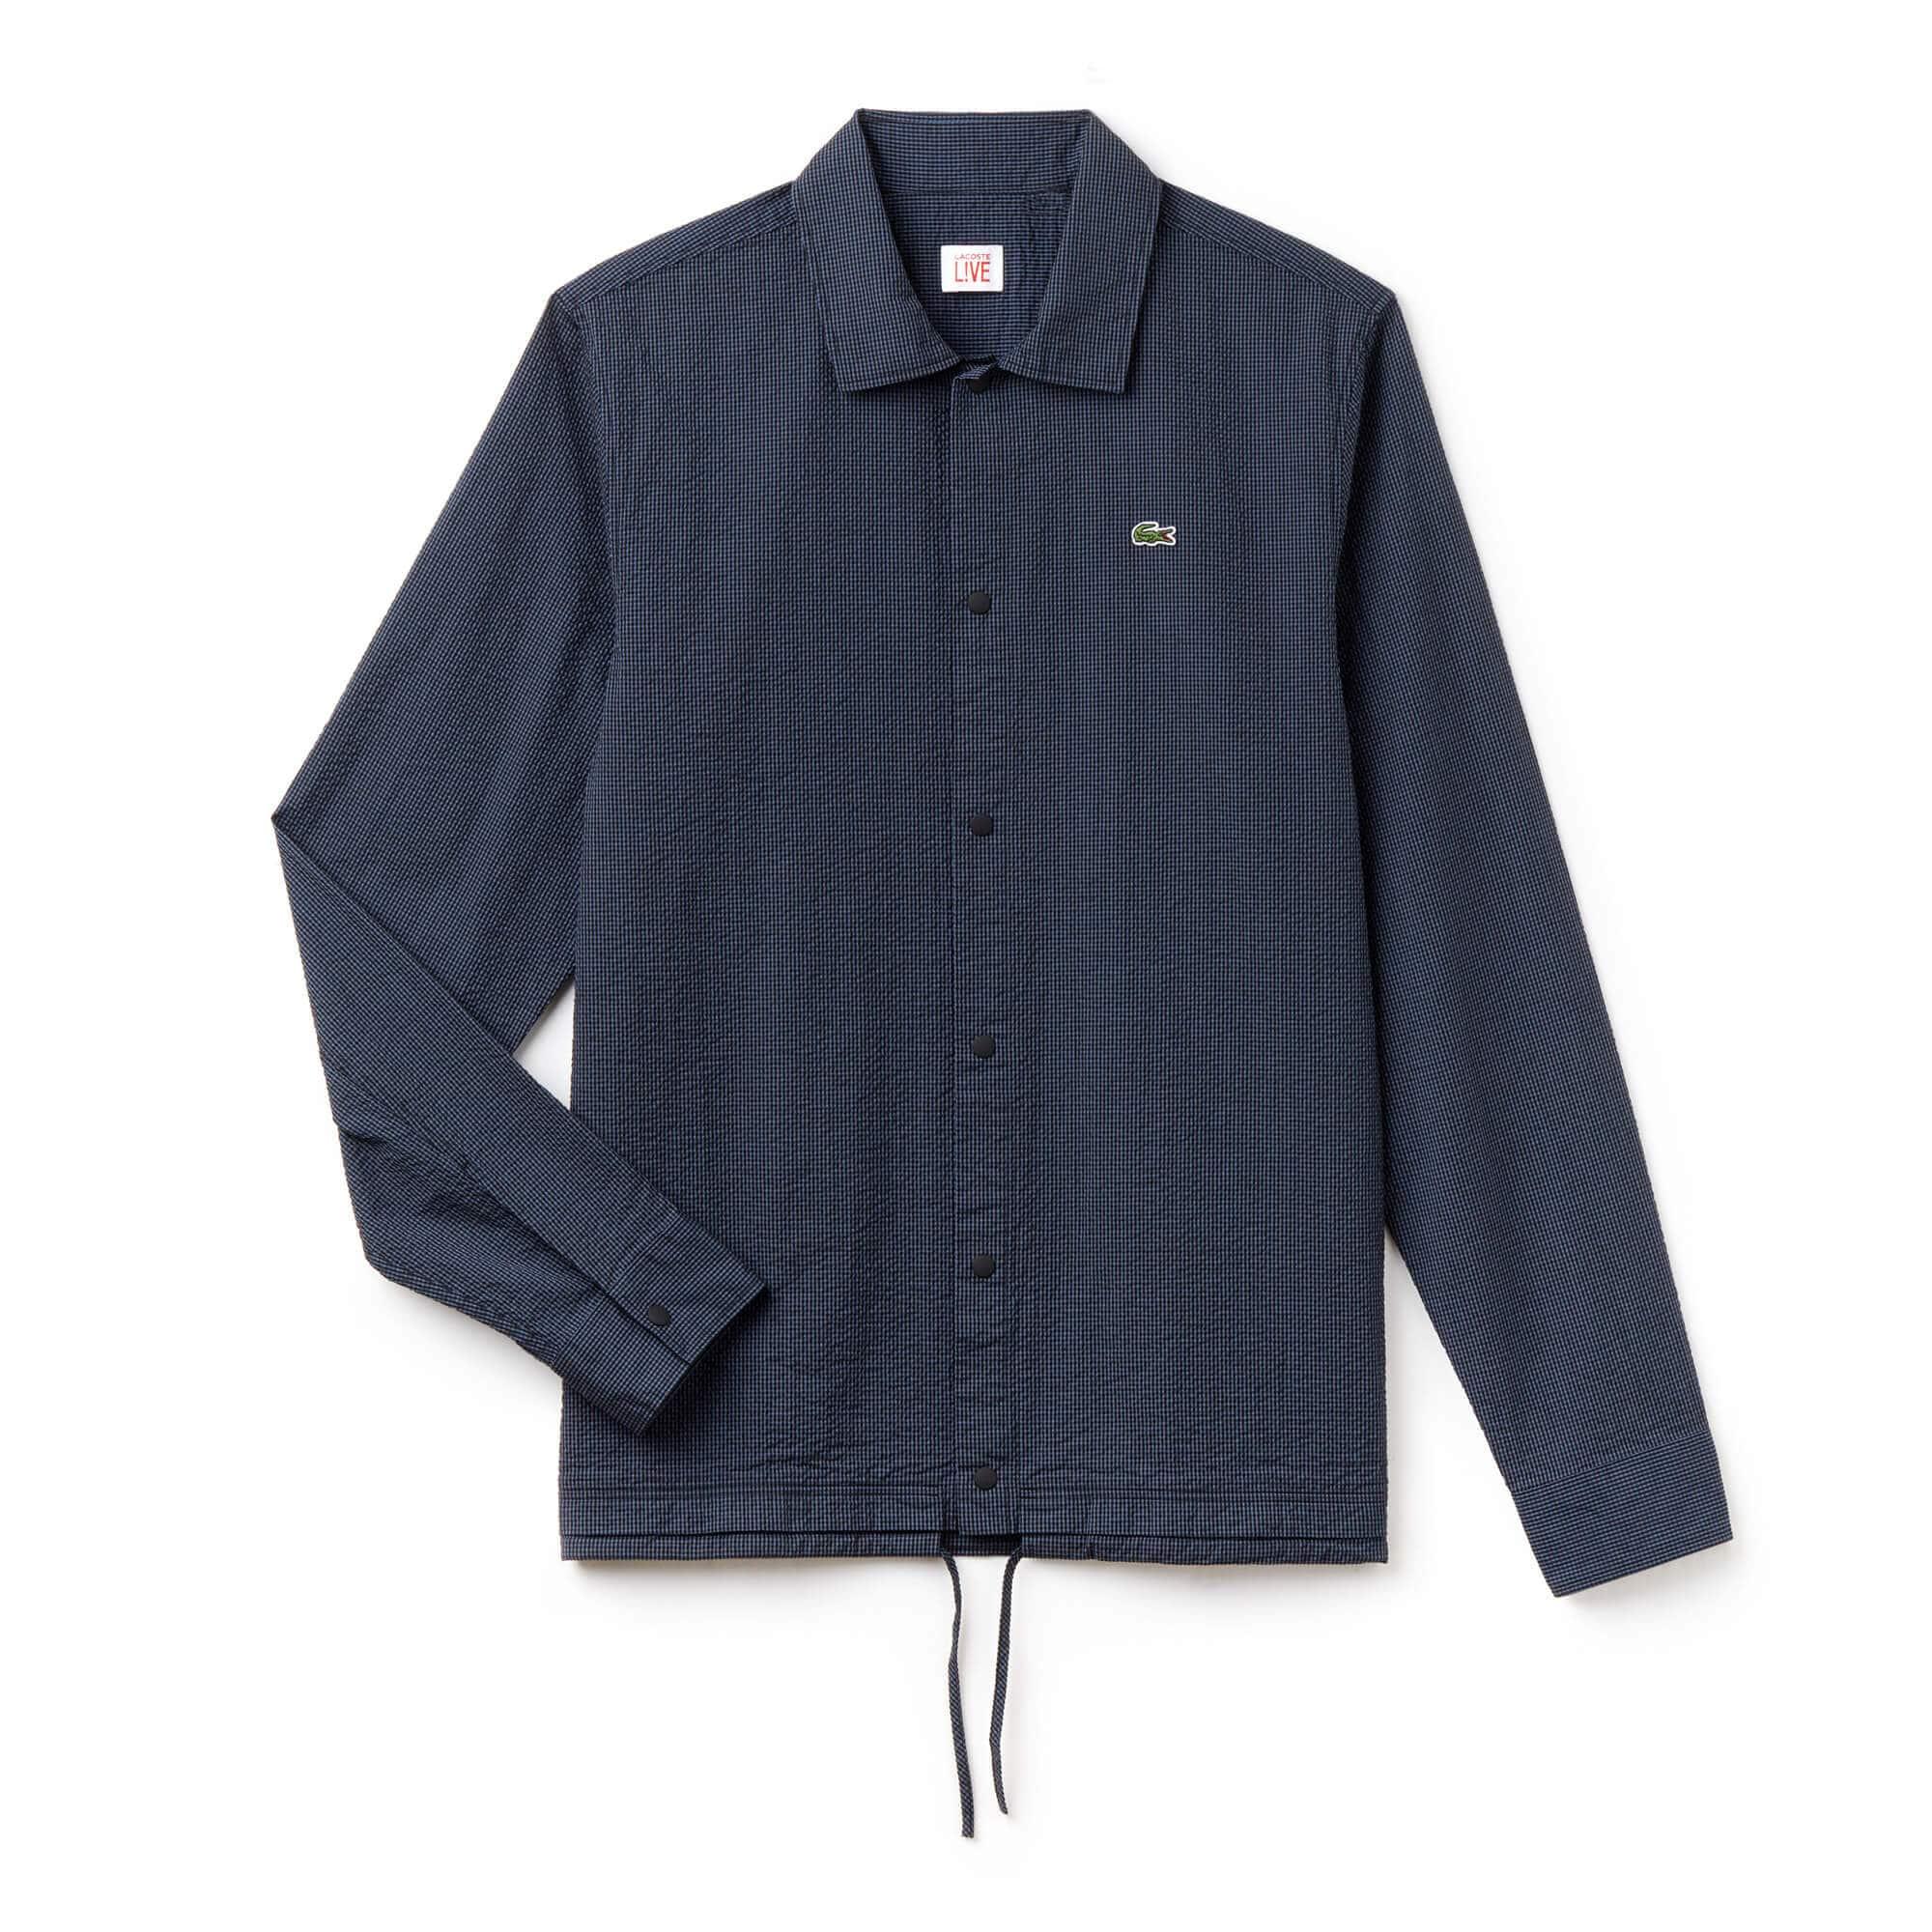 Slim Fit Herren-Hemd aus Seersucker mit Vichy-Muster LACOSTE L!VE